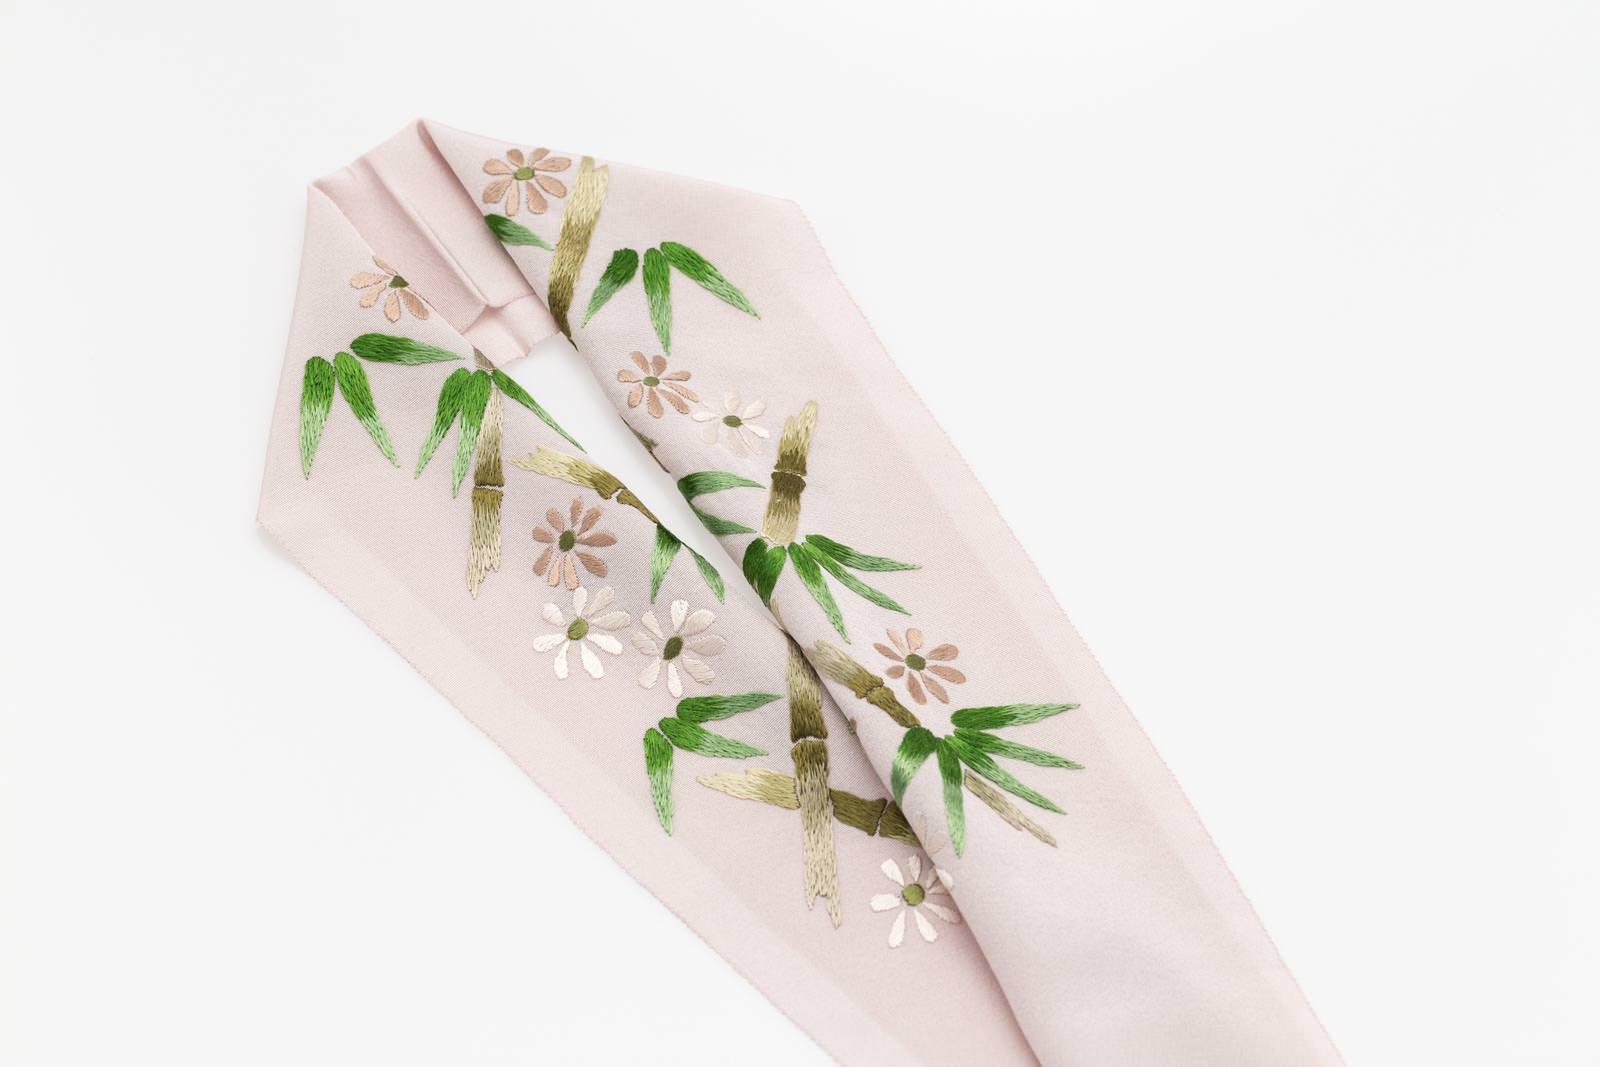 手刺繍 半襟 パールトーン加工済 シルク100% 塩瀬 手刺繍 半衿 灰桜 竹笹小菊